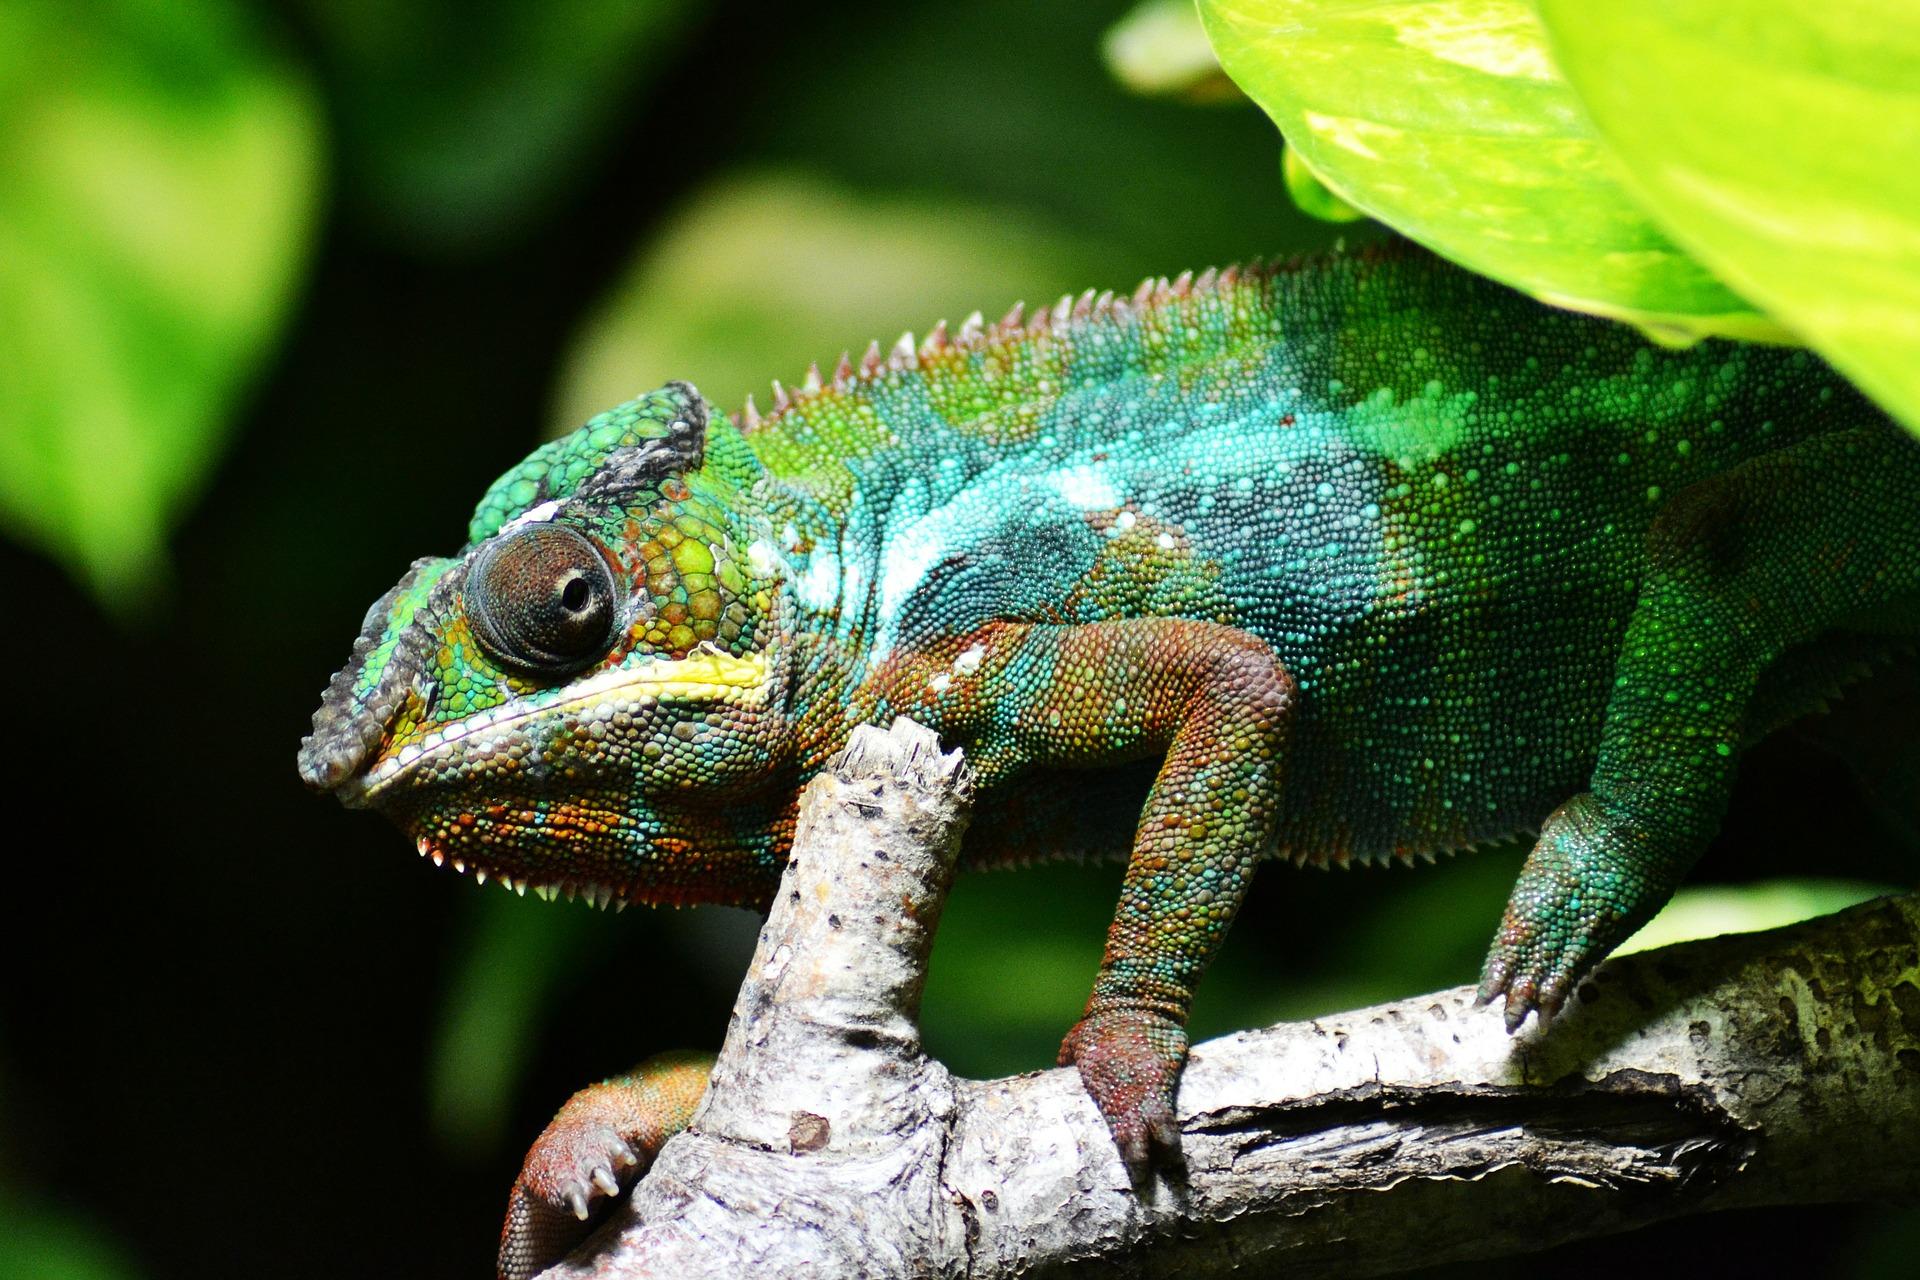 The Corporate Chameleon